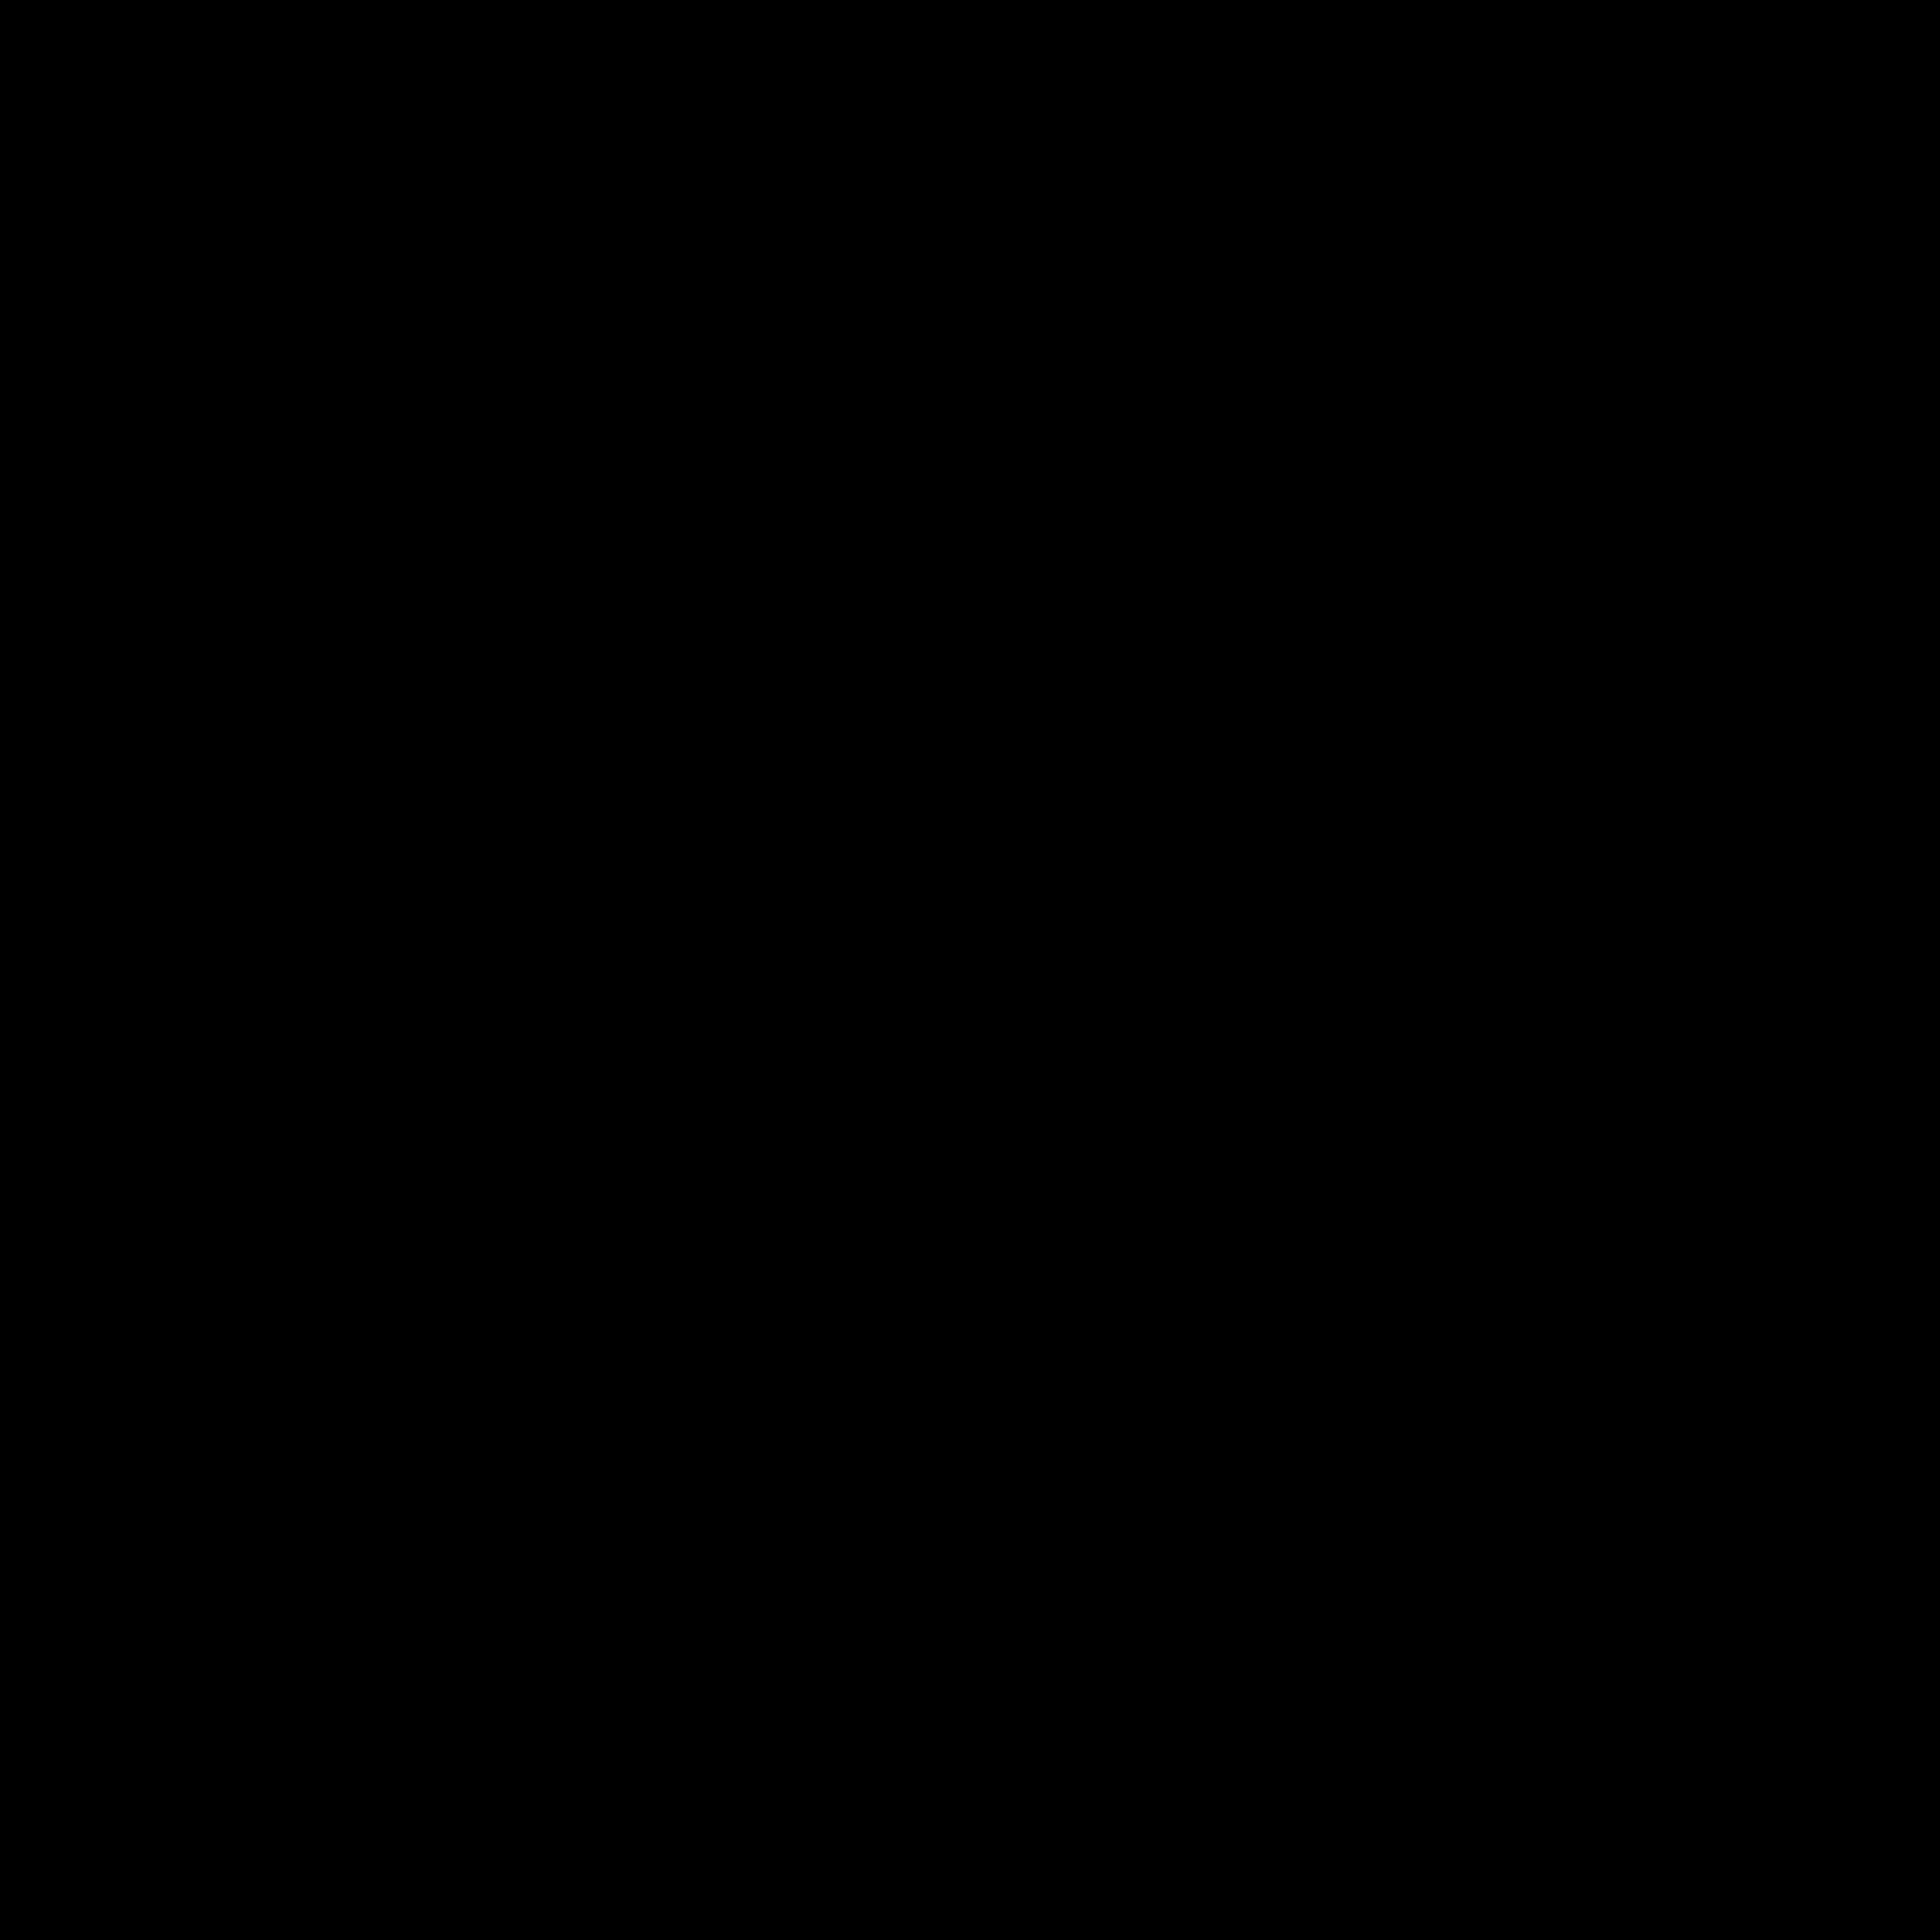 Kisspng Logo Social Media Facebook Brand Clip Art Facebook Logo Png White Transparent Png Full Size Clipart 364346 Pinclipart